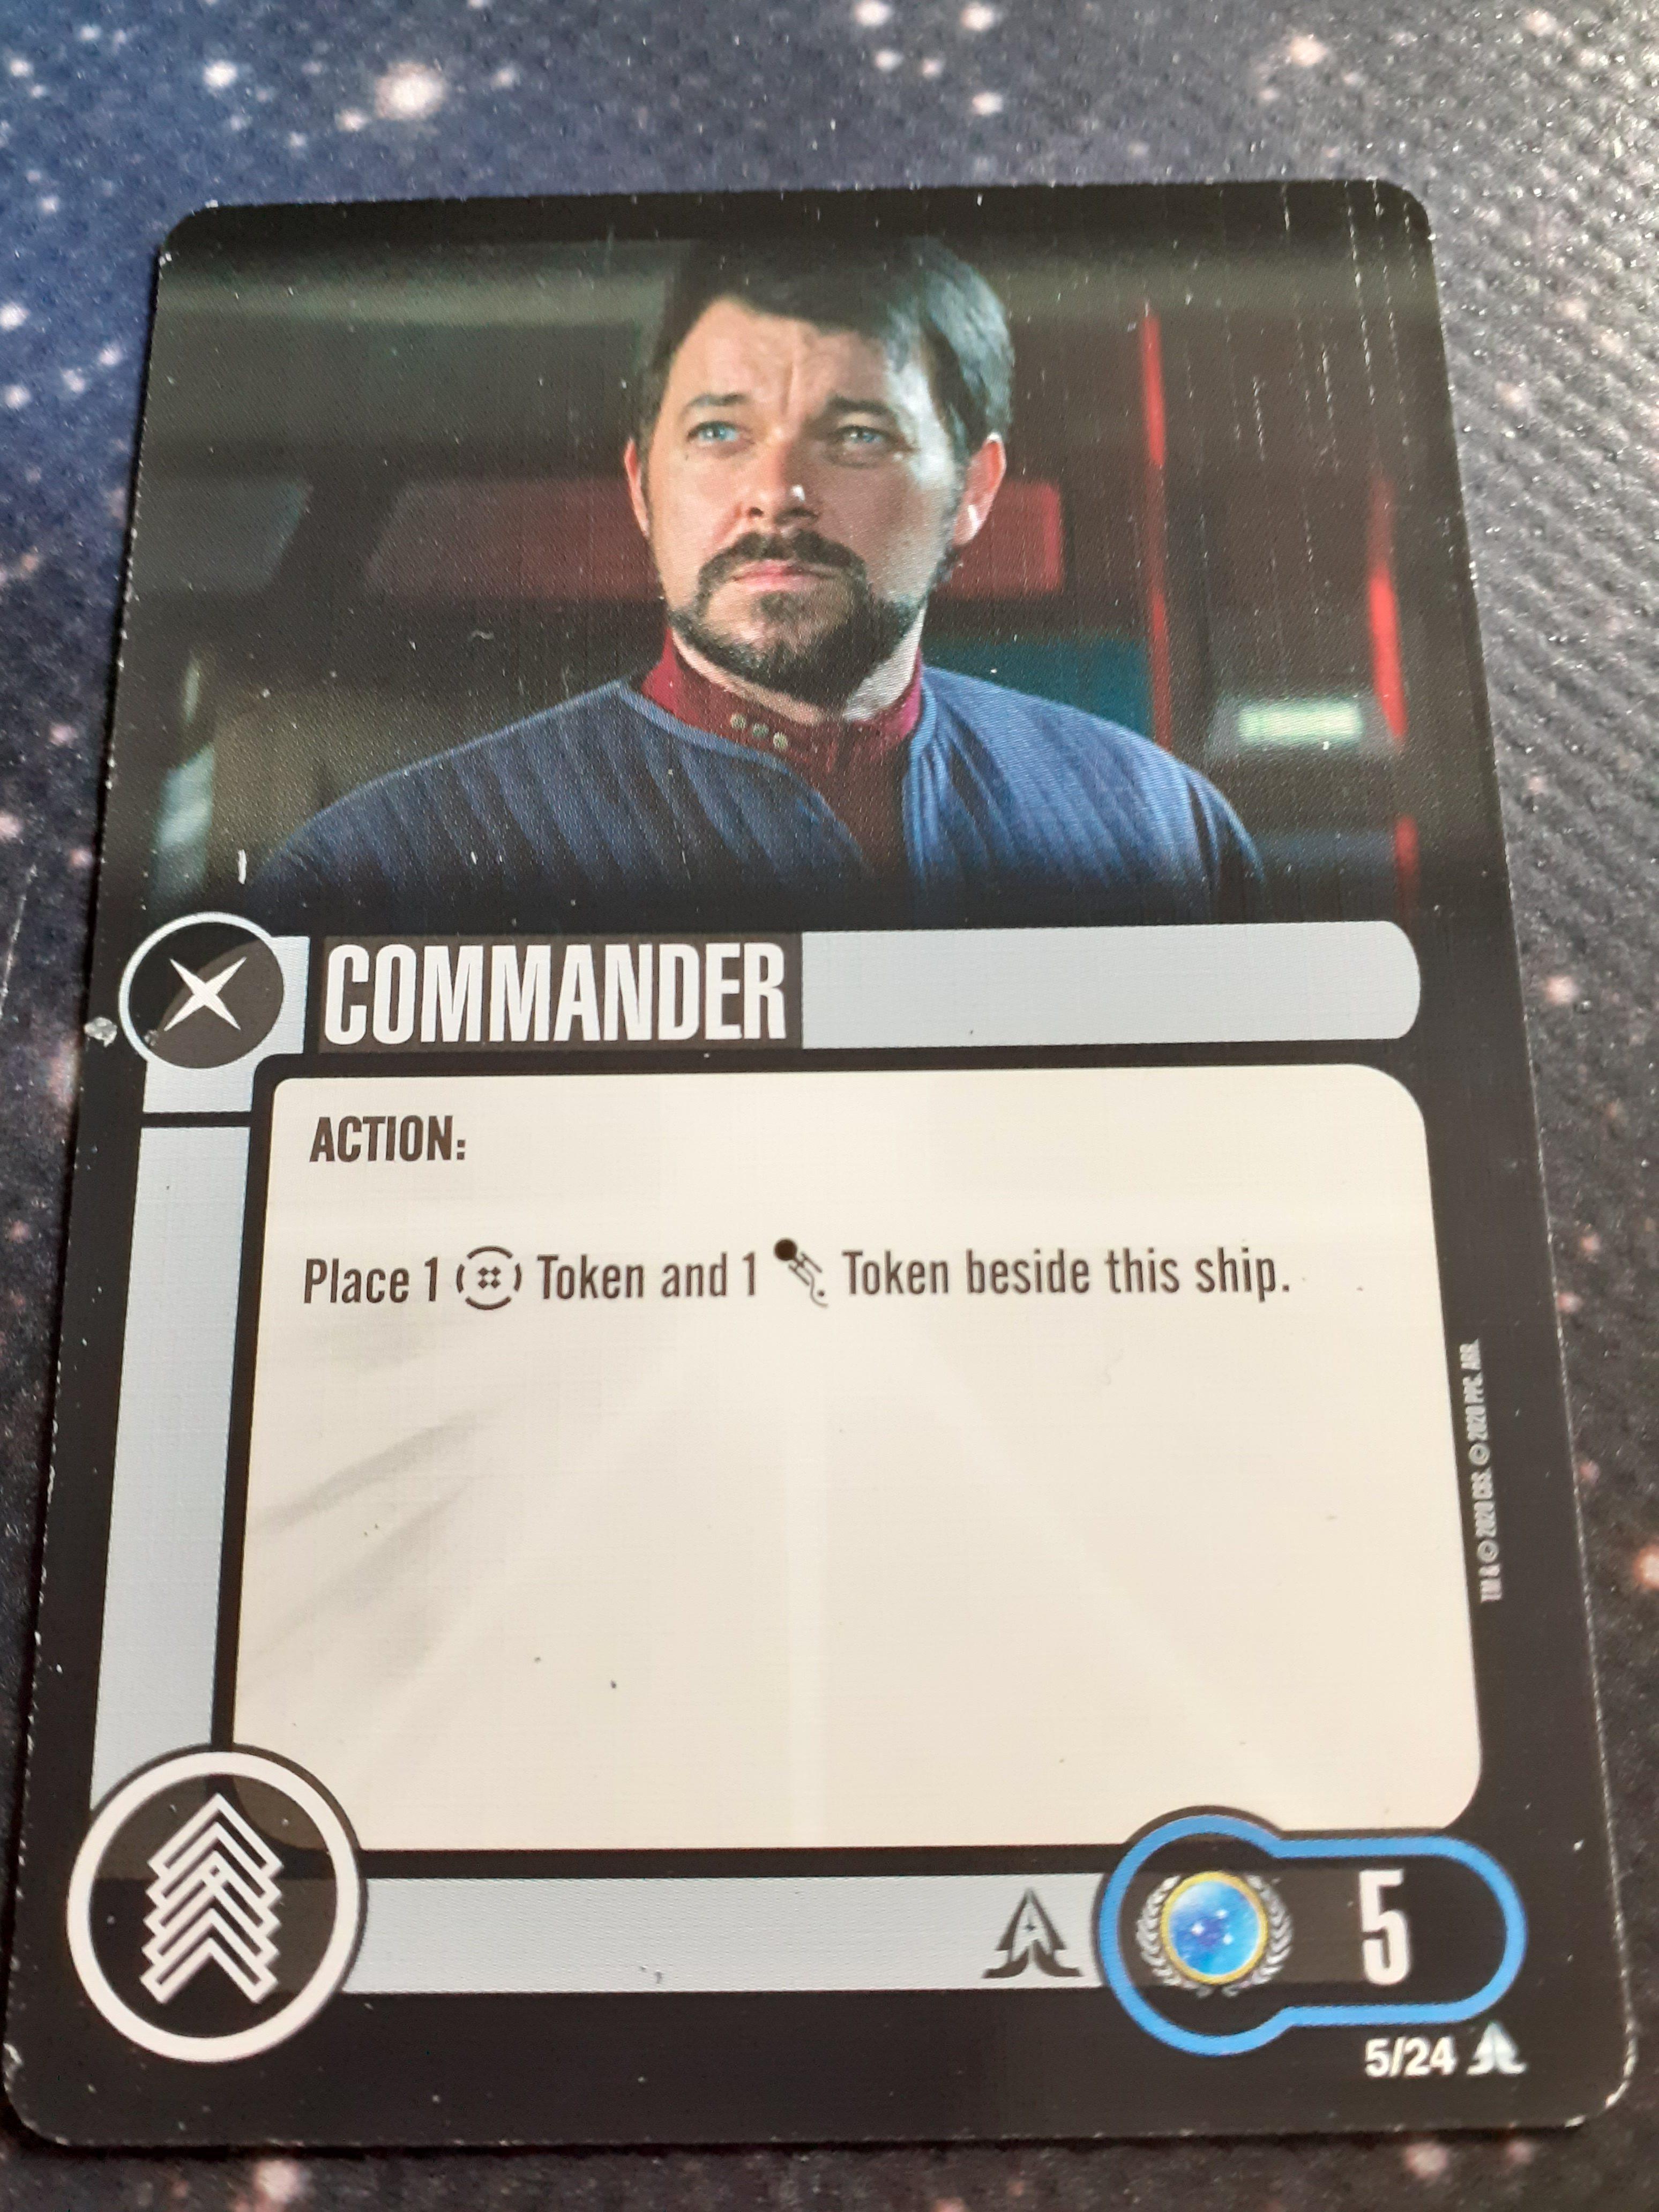 [Star Trek Alliance - Dominion War Campaign I] Computerlogbuch der Solo-Kampagne von Commander Cut  20210219_153542-e1613781983770